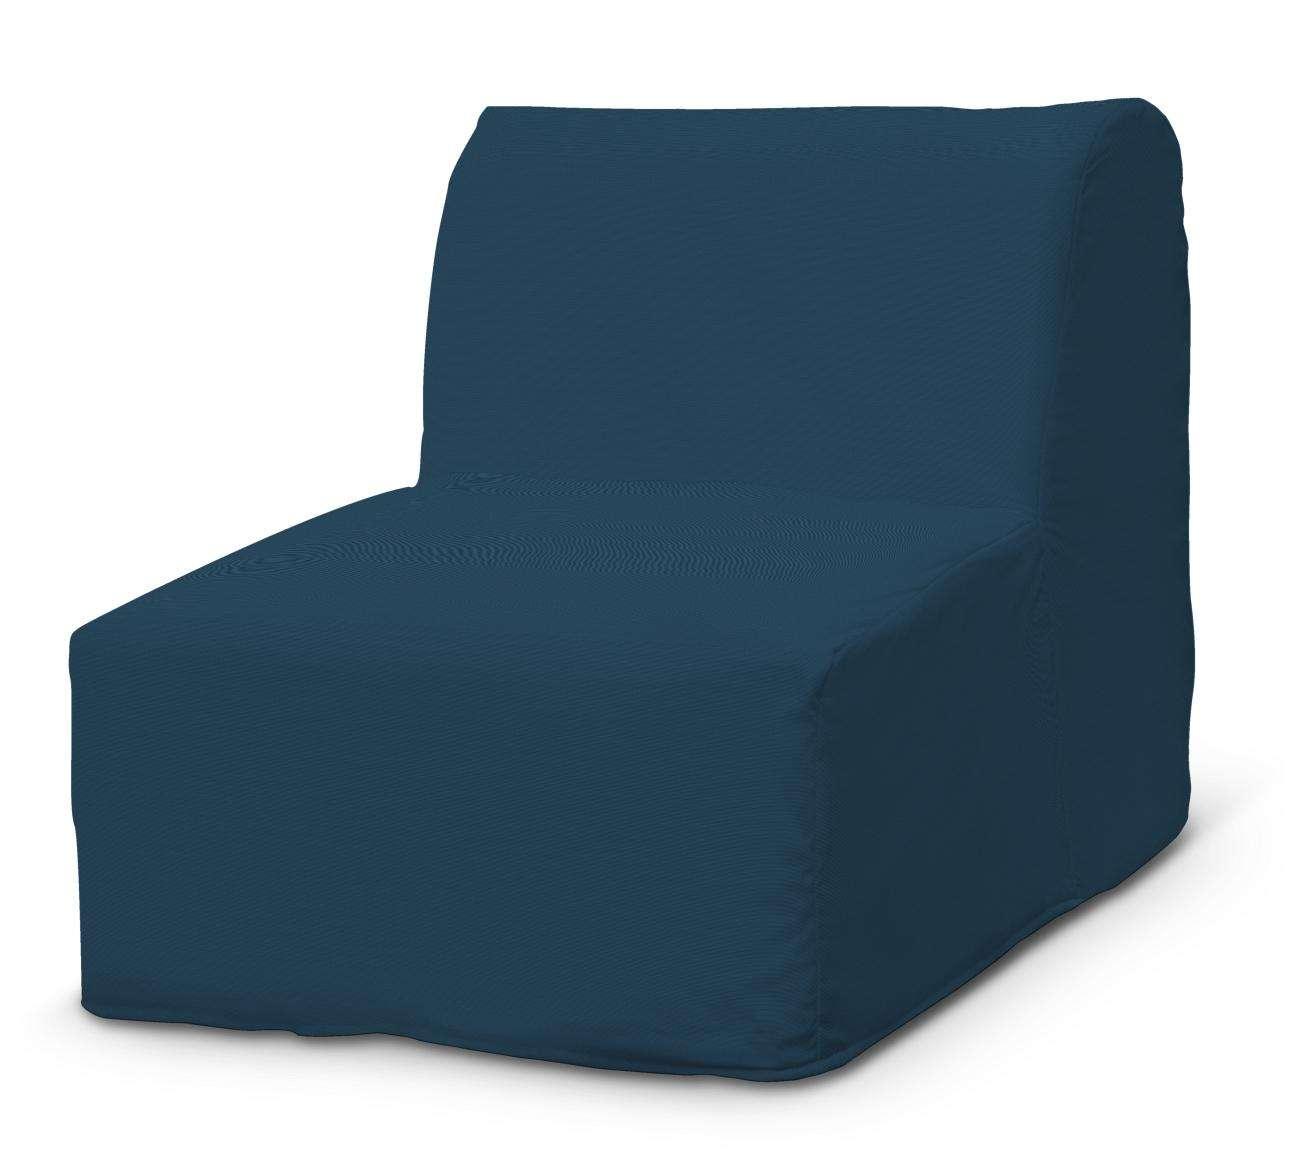 Pokrowiec na fotel Lycksele prosty fotel Lycksele w kolekcji Cotton Panama, tkanina: 702-30